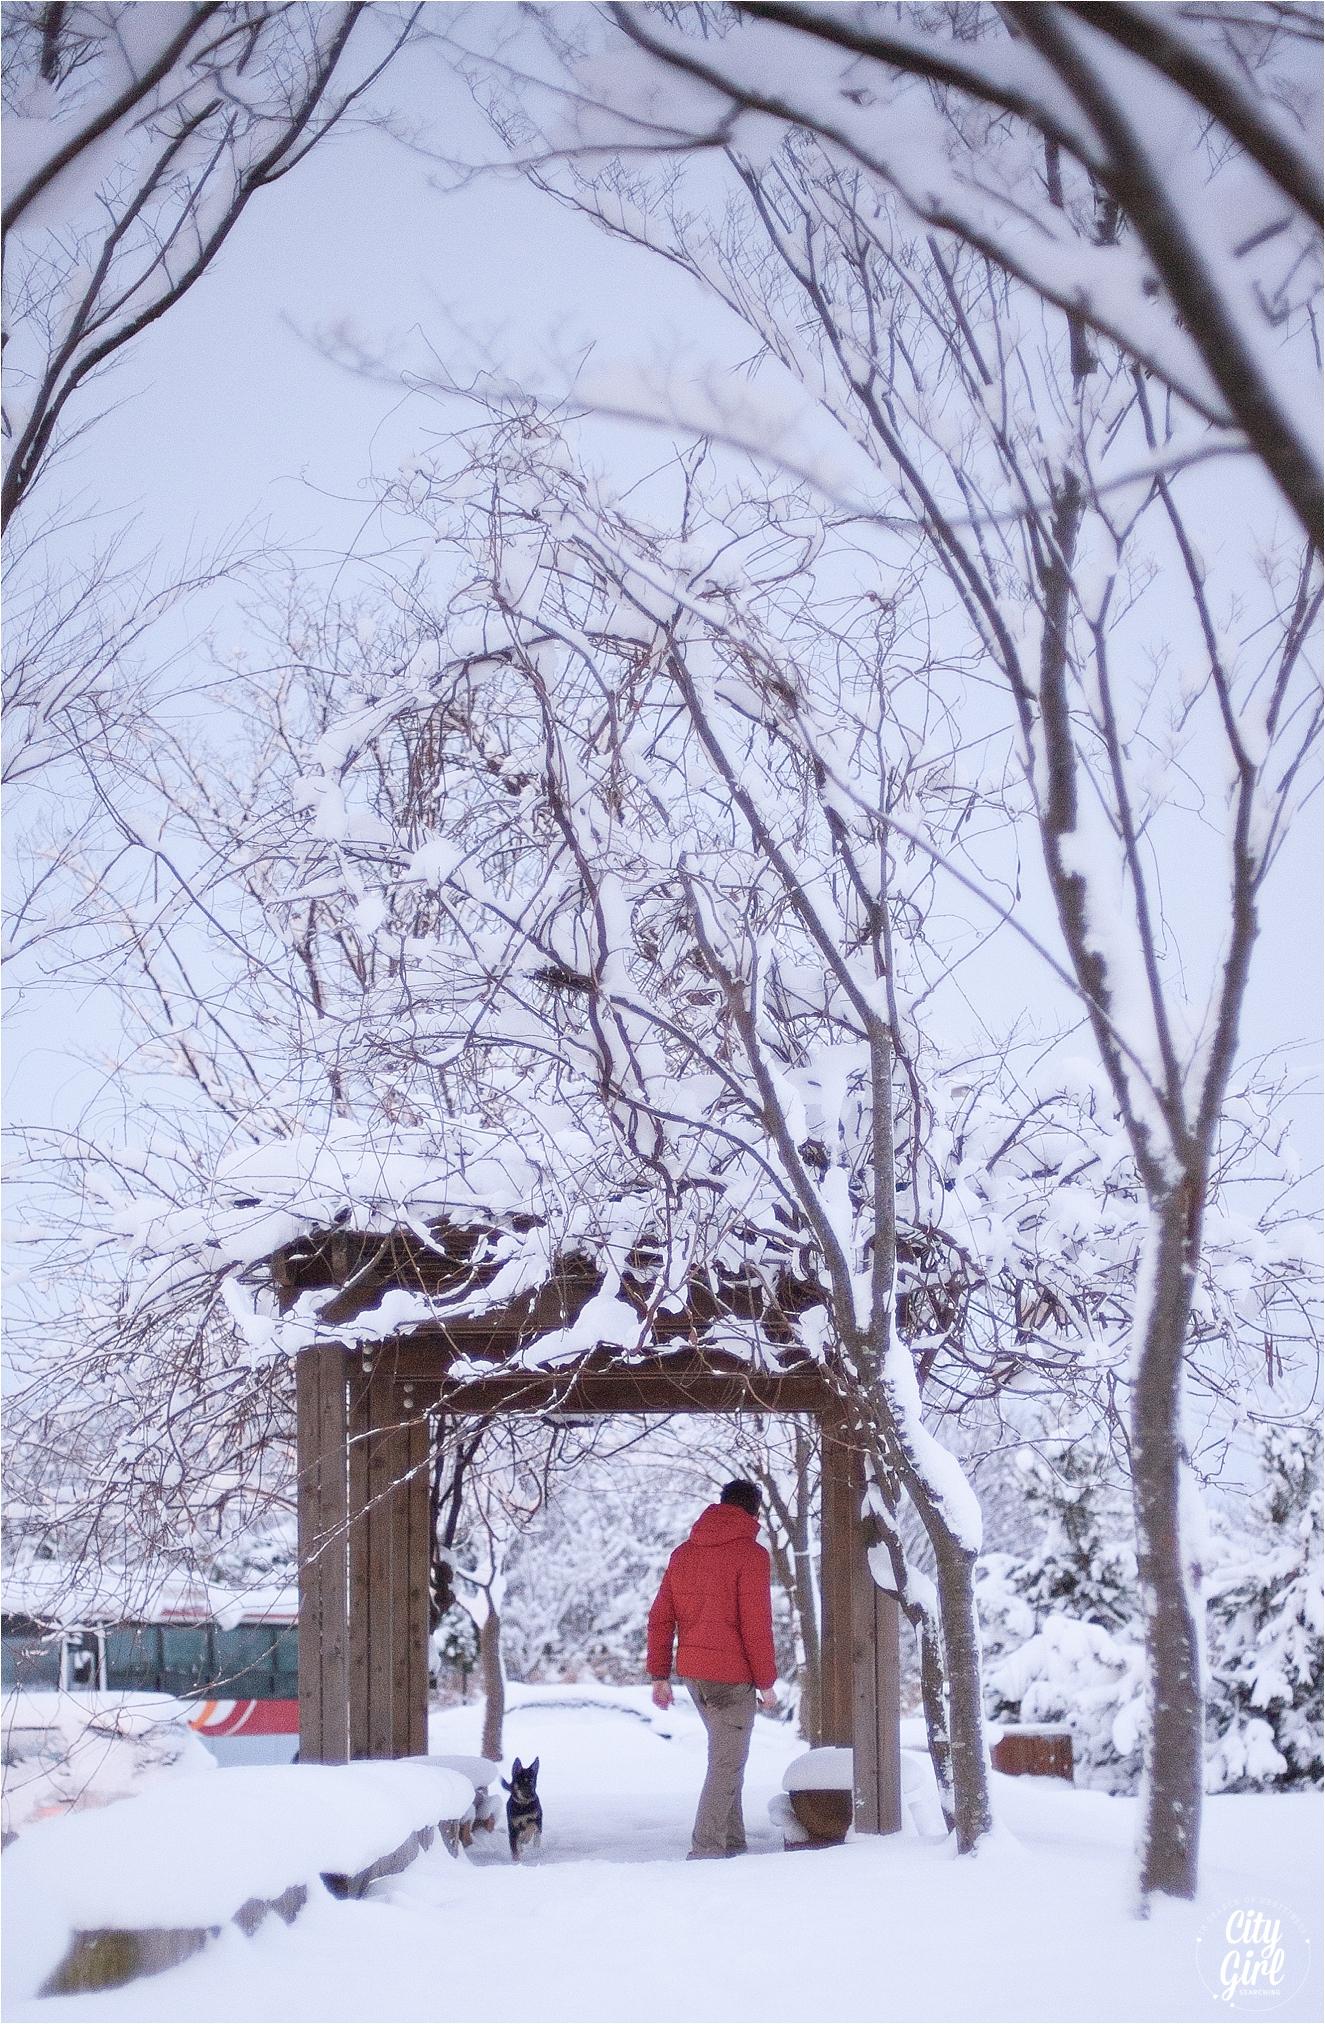 SnowInKorea_0007.jpg